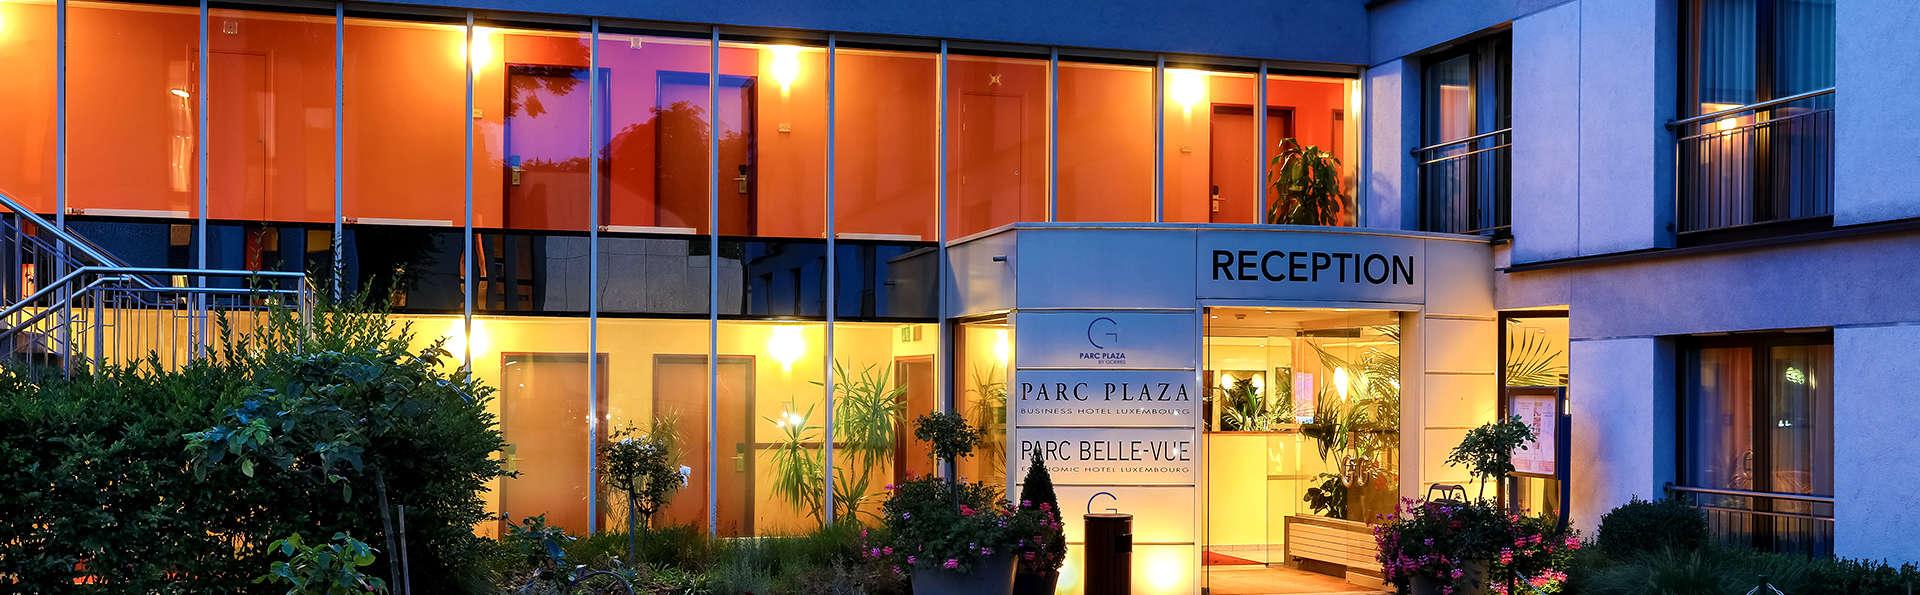 Hotel Parc Plaza - Edit_Front2.jpg